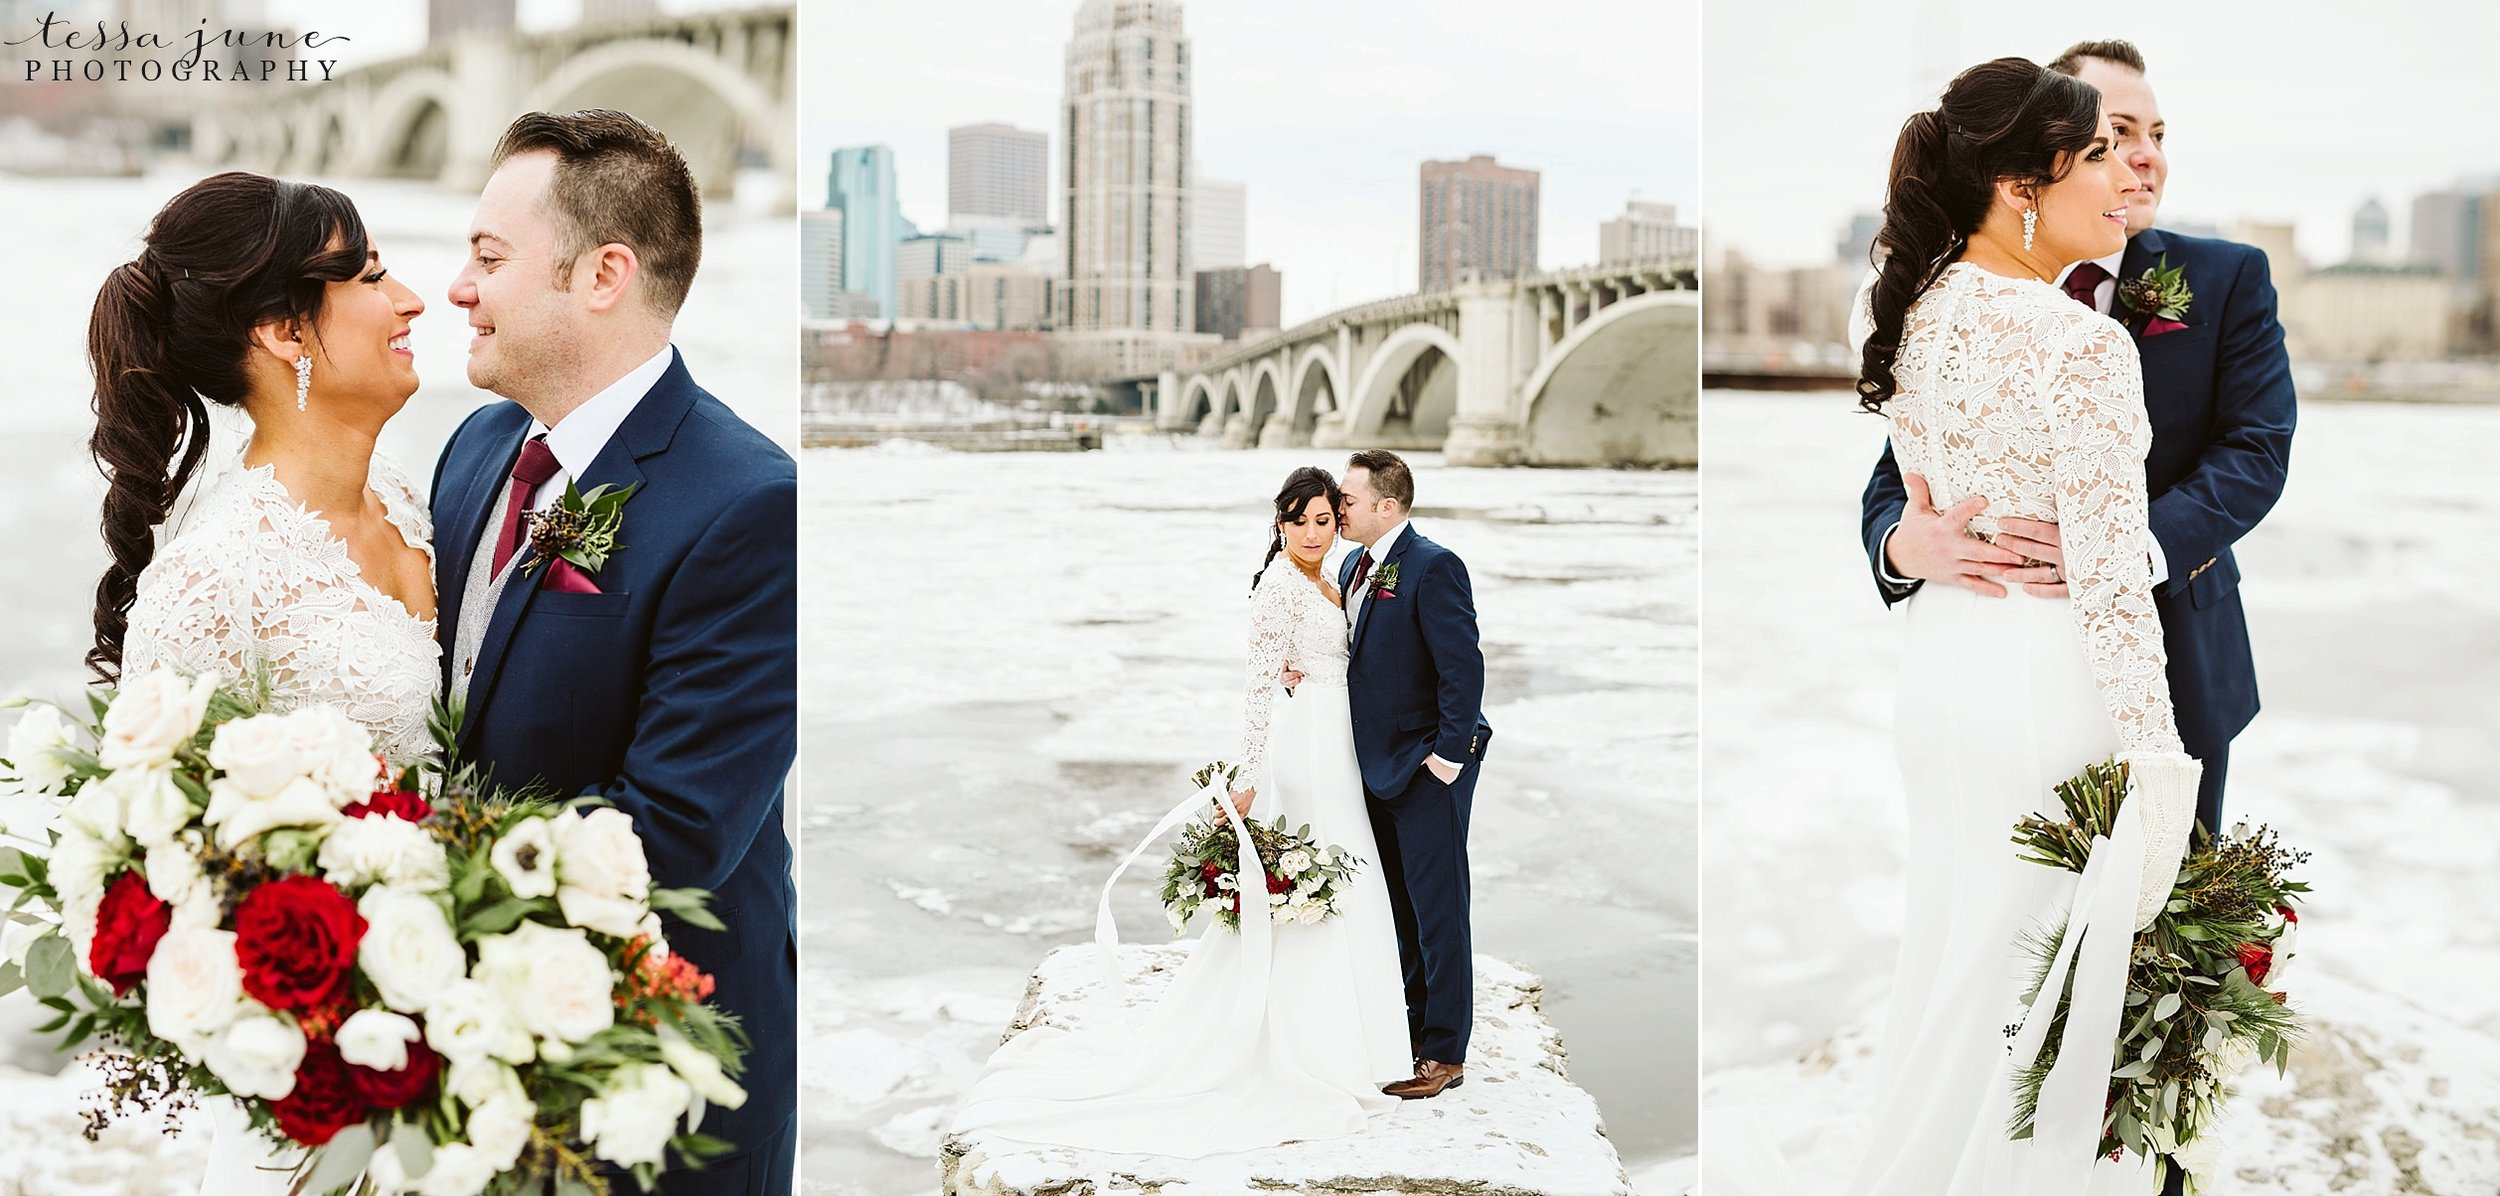 minneapolis-event-center-winter-romantic-snow-wedding-december-87.jpg